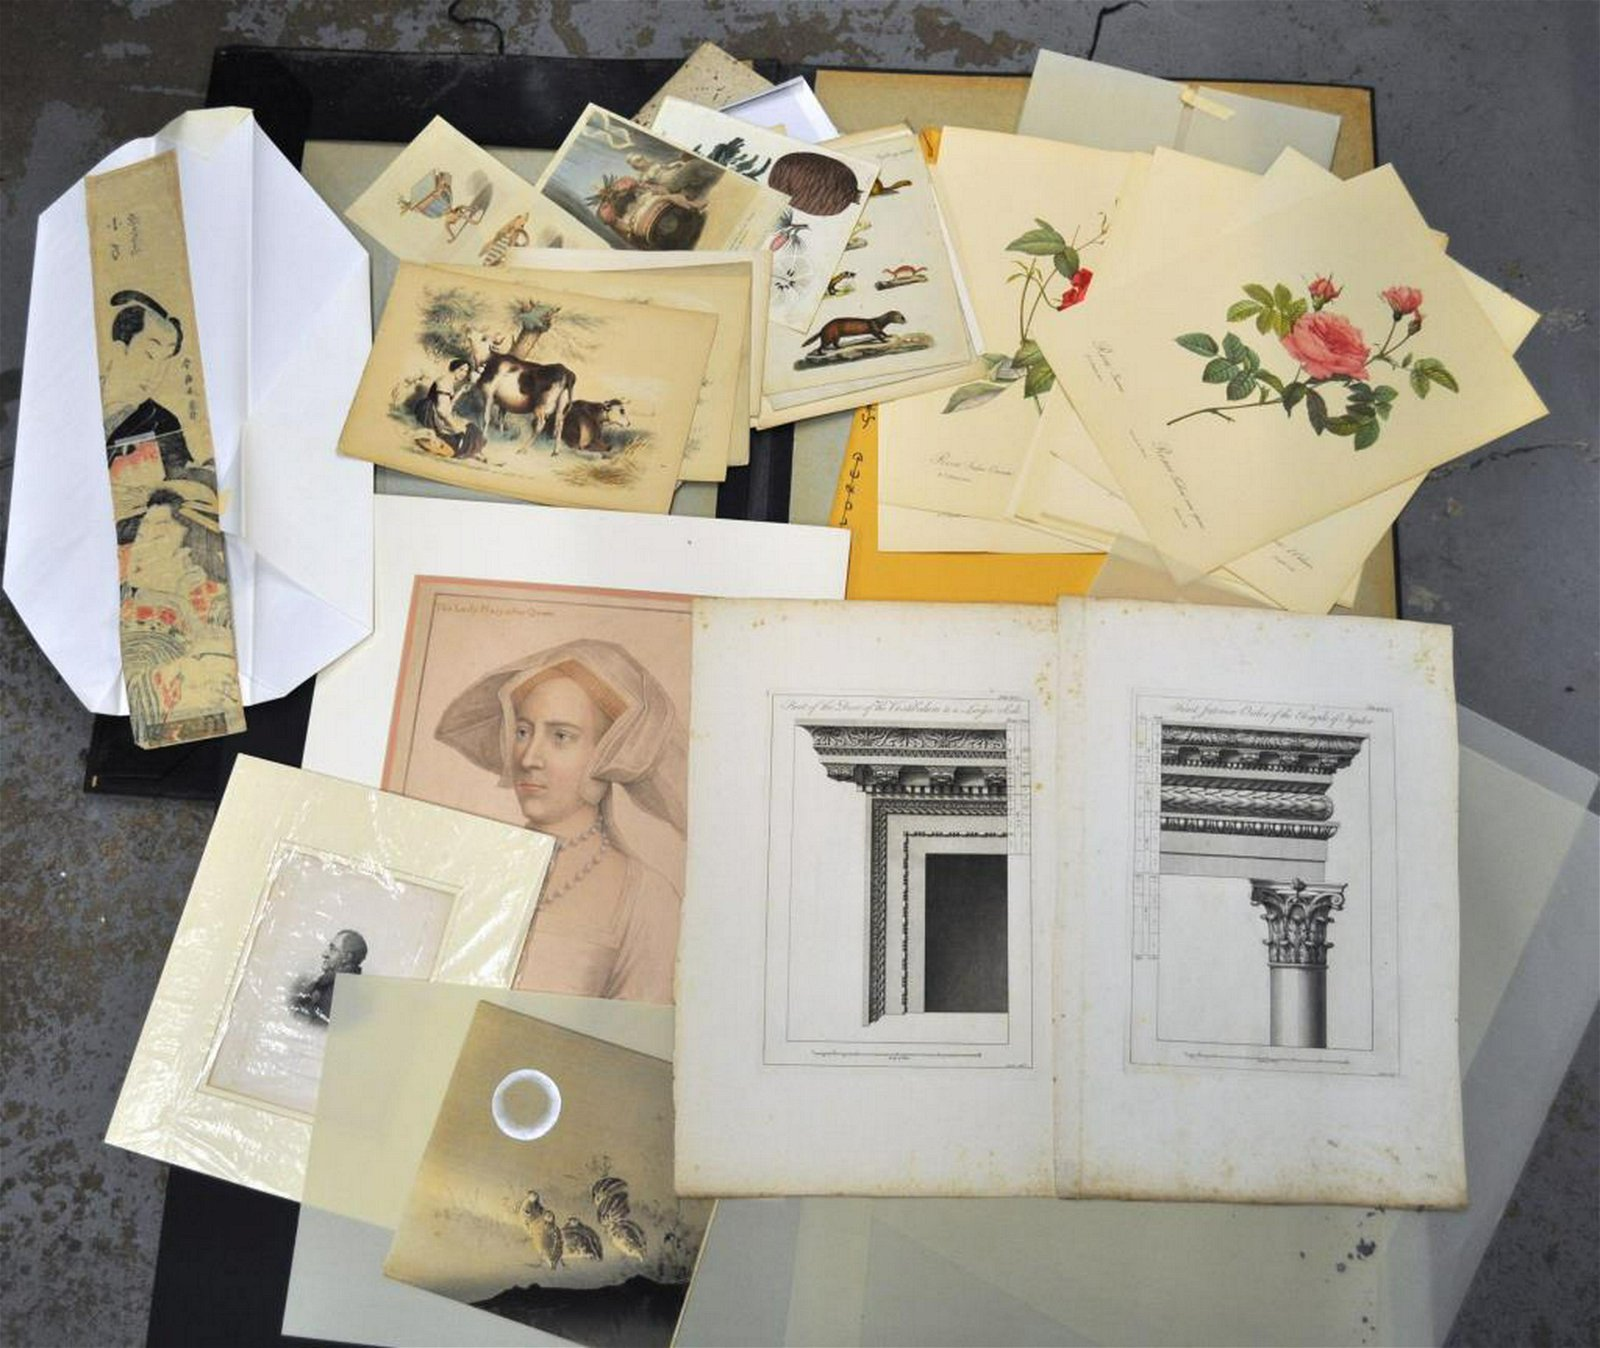 Folio Assorted Unframed Artworks